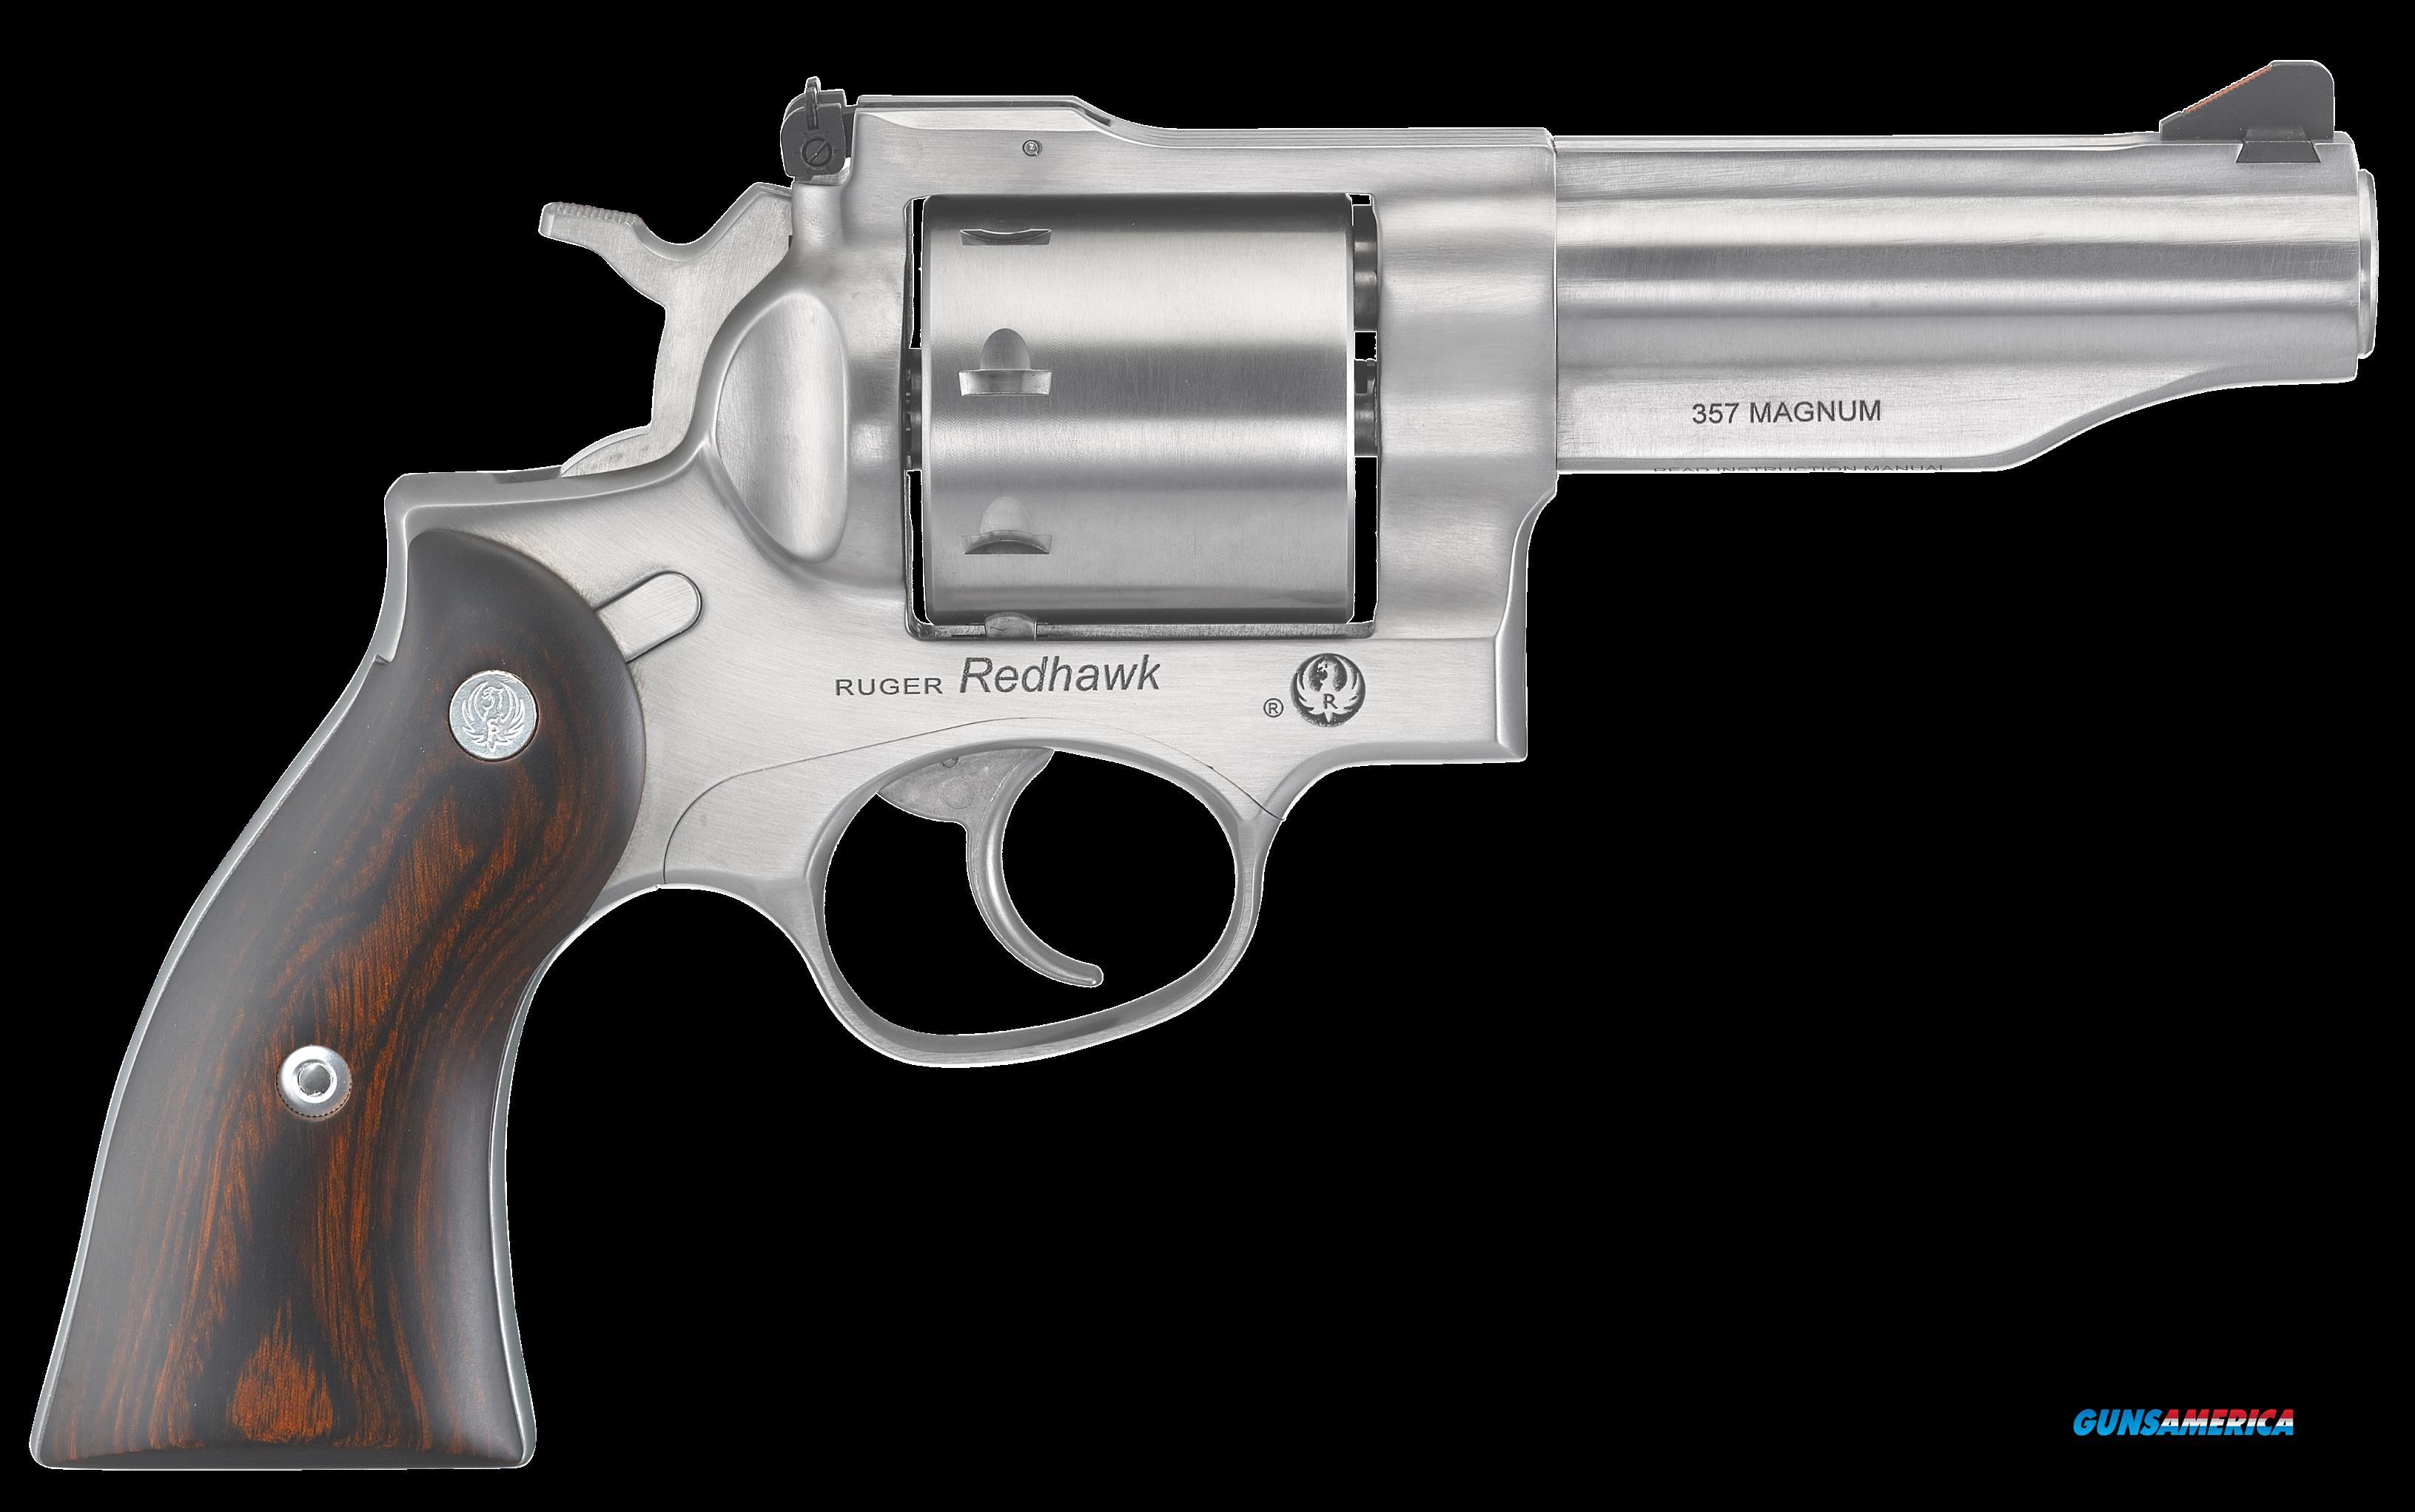 Ruger Redhawk, Rug 5059  Redhwk   357    4.2    8rd Ss-wood  Guns > Pistols > 1911 Pistol Copies (non-Colt)